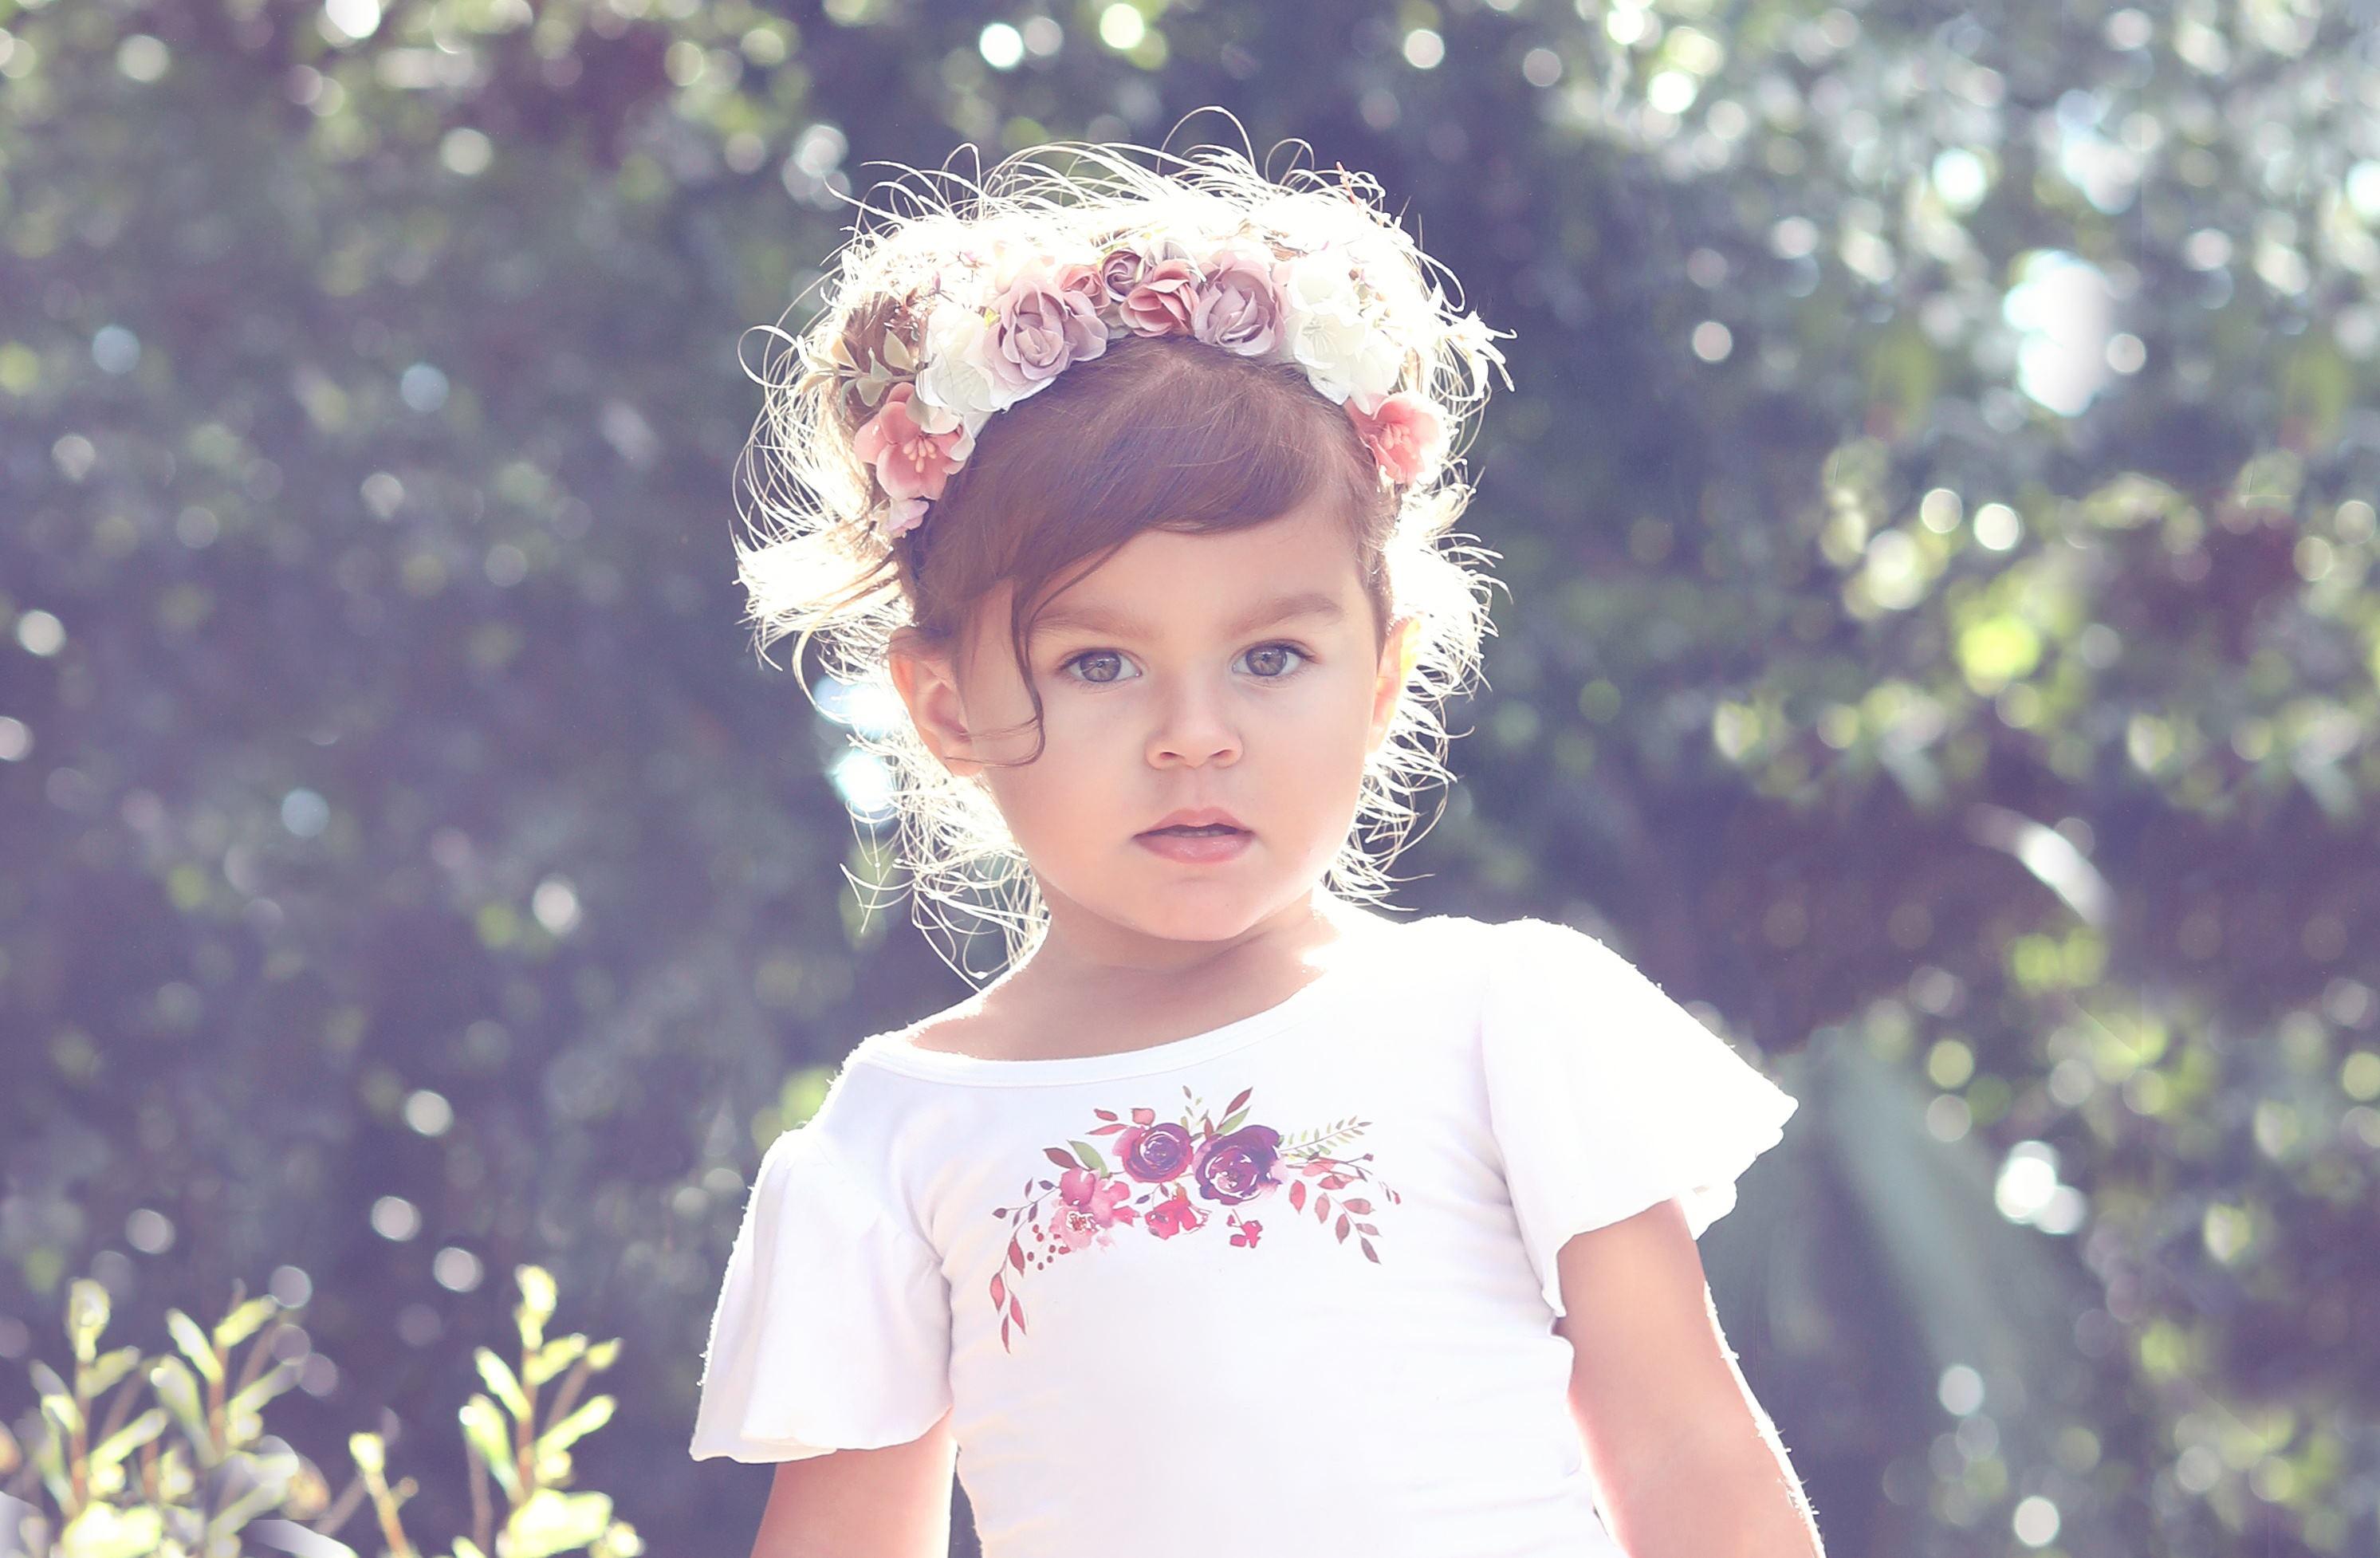 – 5 d Katherine Eastman portrait photography Miami south florida beauty fairytale fashion babiekins ohio blog flower crown sweet face